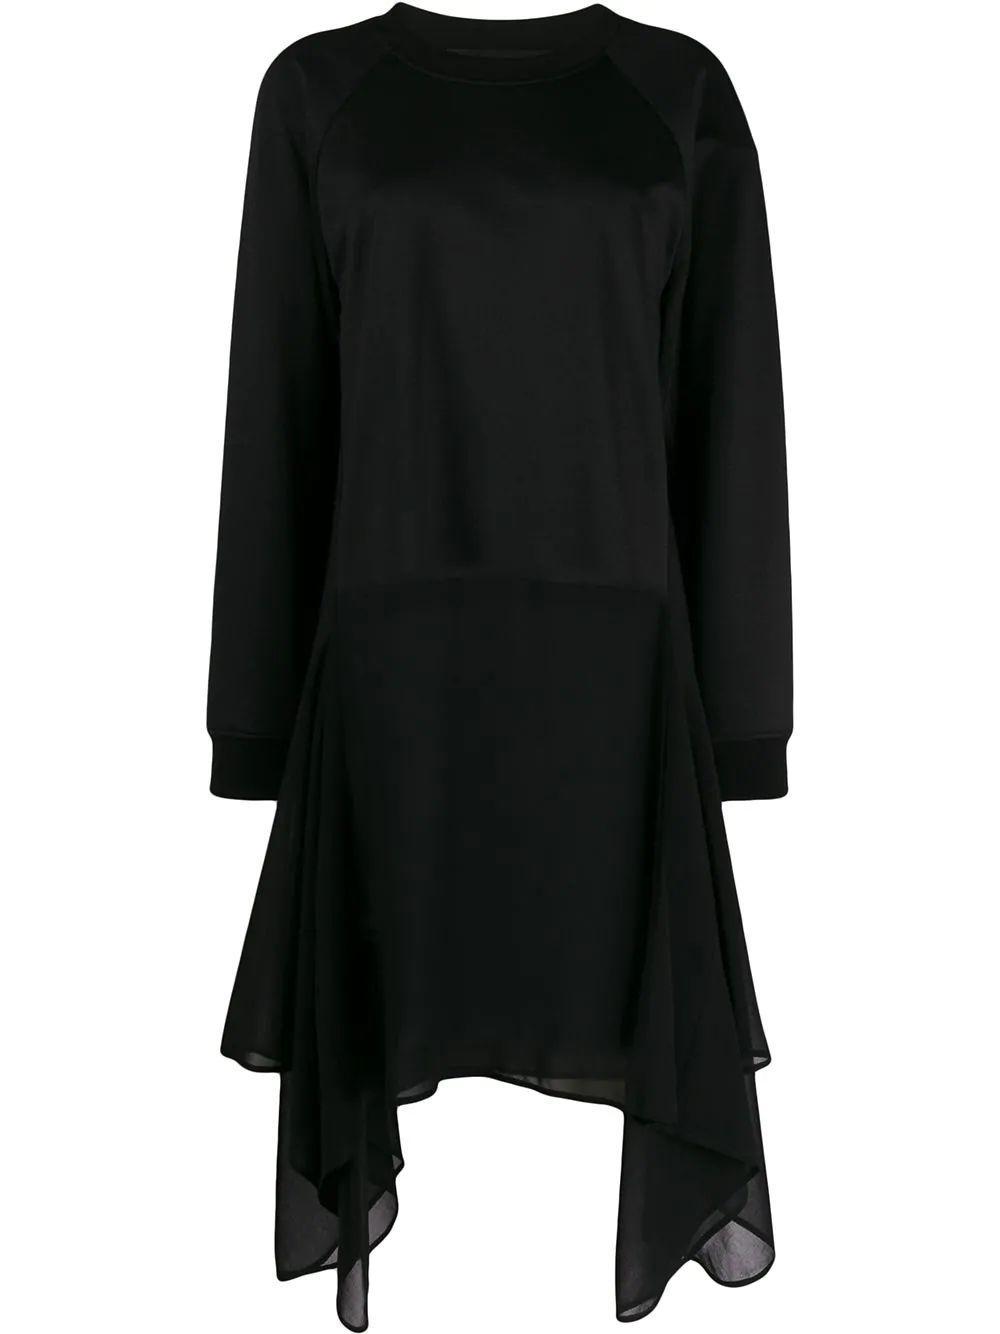 Sweatshirt Top With Georgette Bottom Item # U1340-UER